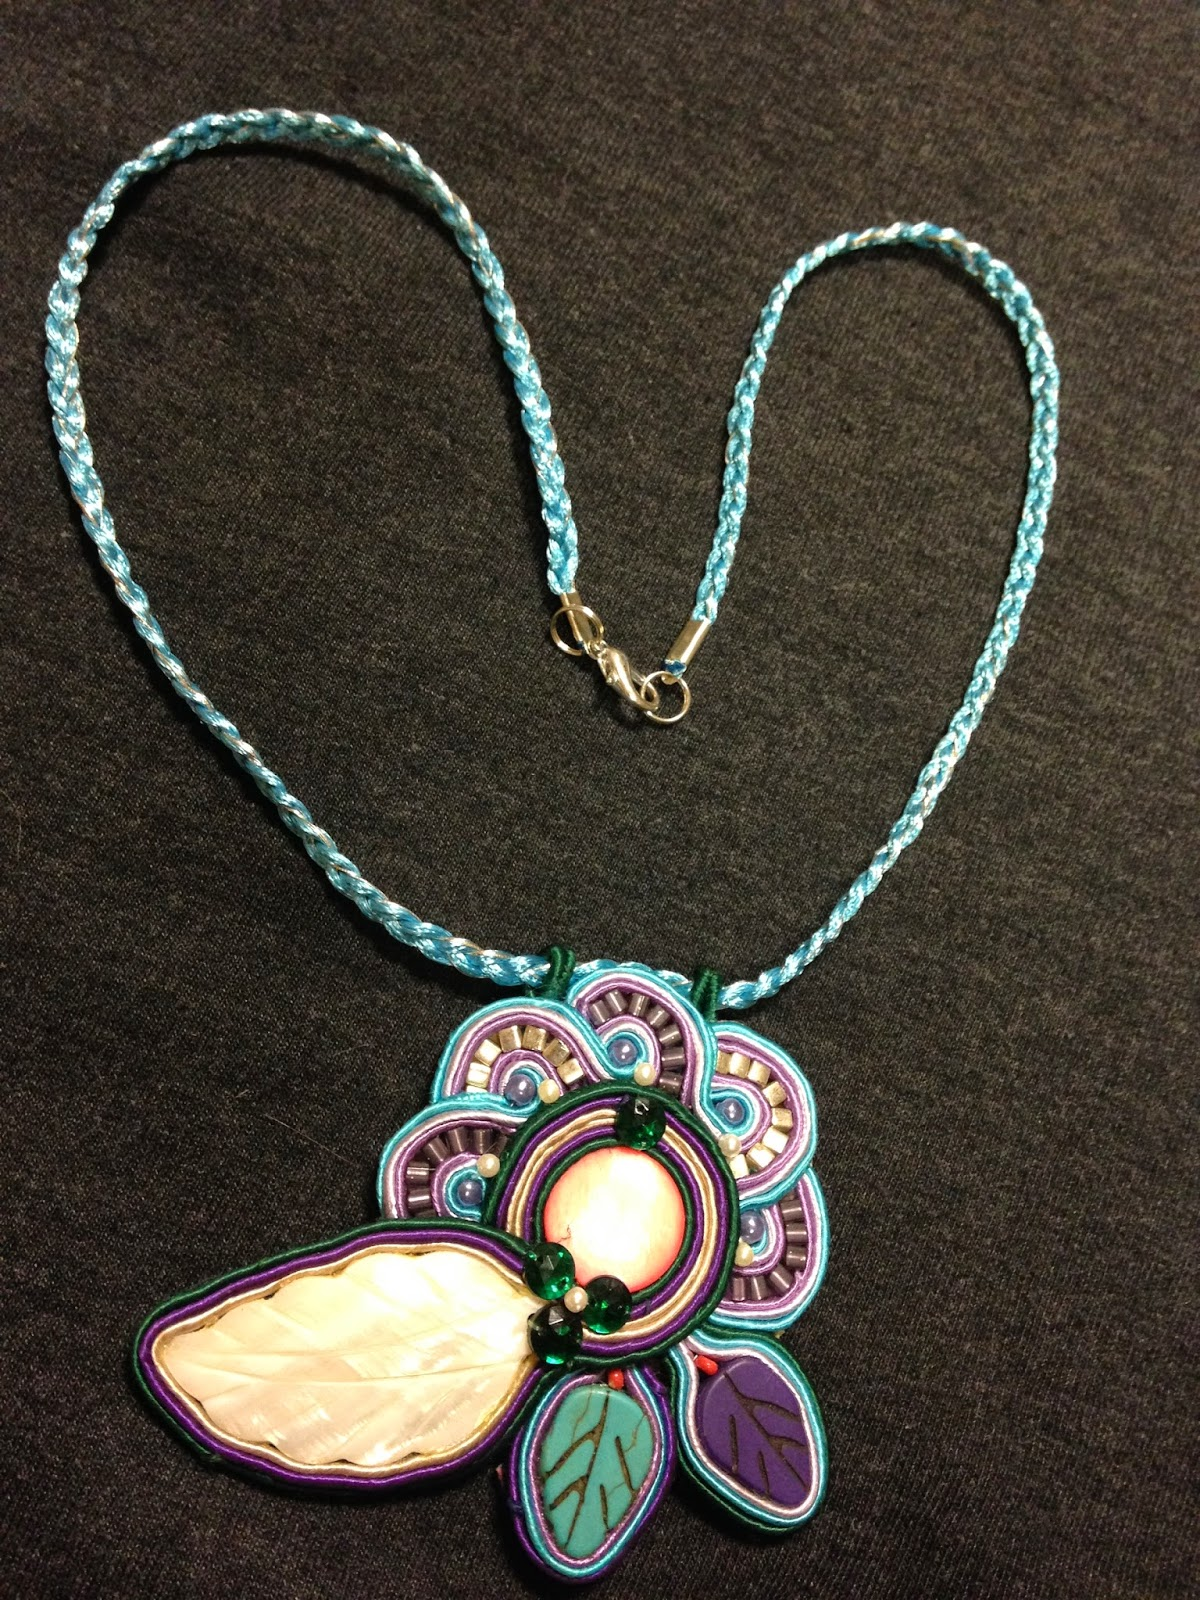 Soutache, bisutería, soutache jewelry,joyería artesana,Hand embroidered jewelry, Swarovski, collar, colgante, pendientes, broches, brazaletes, pulseras,